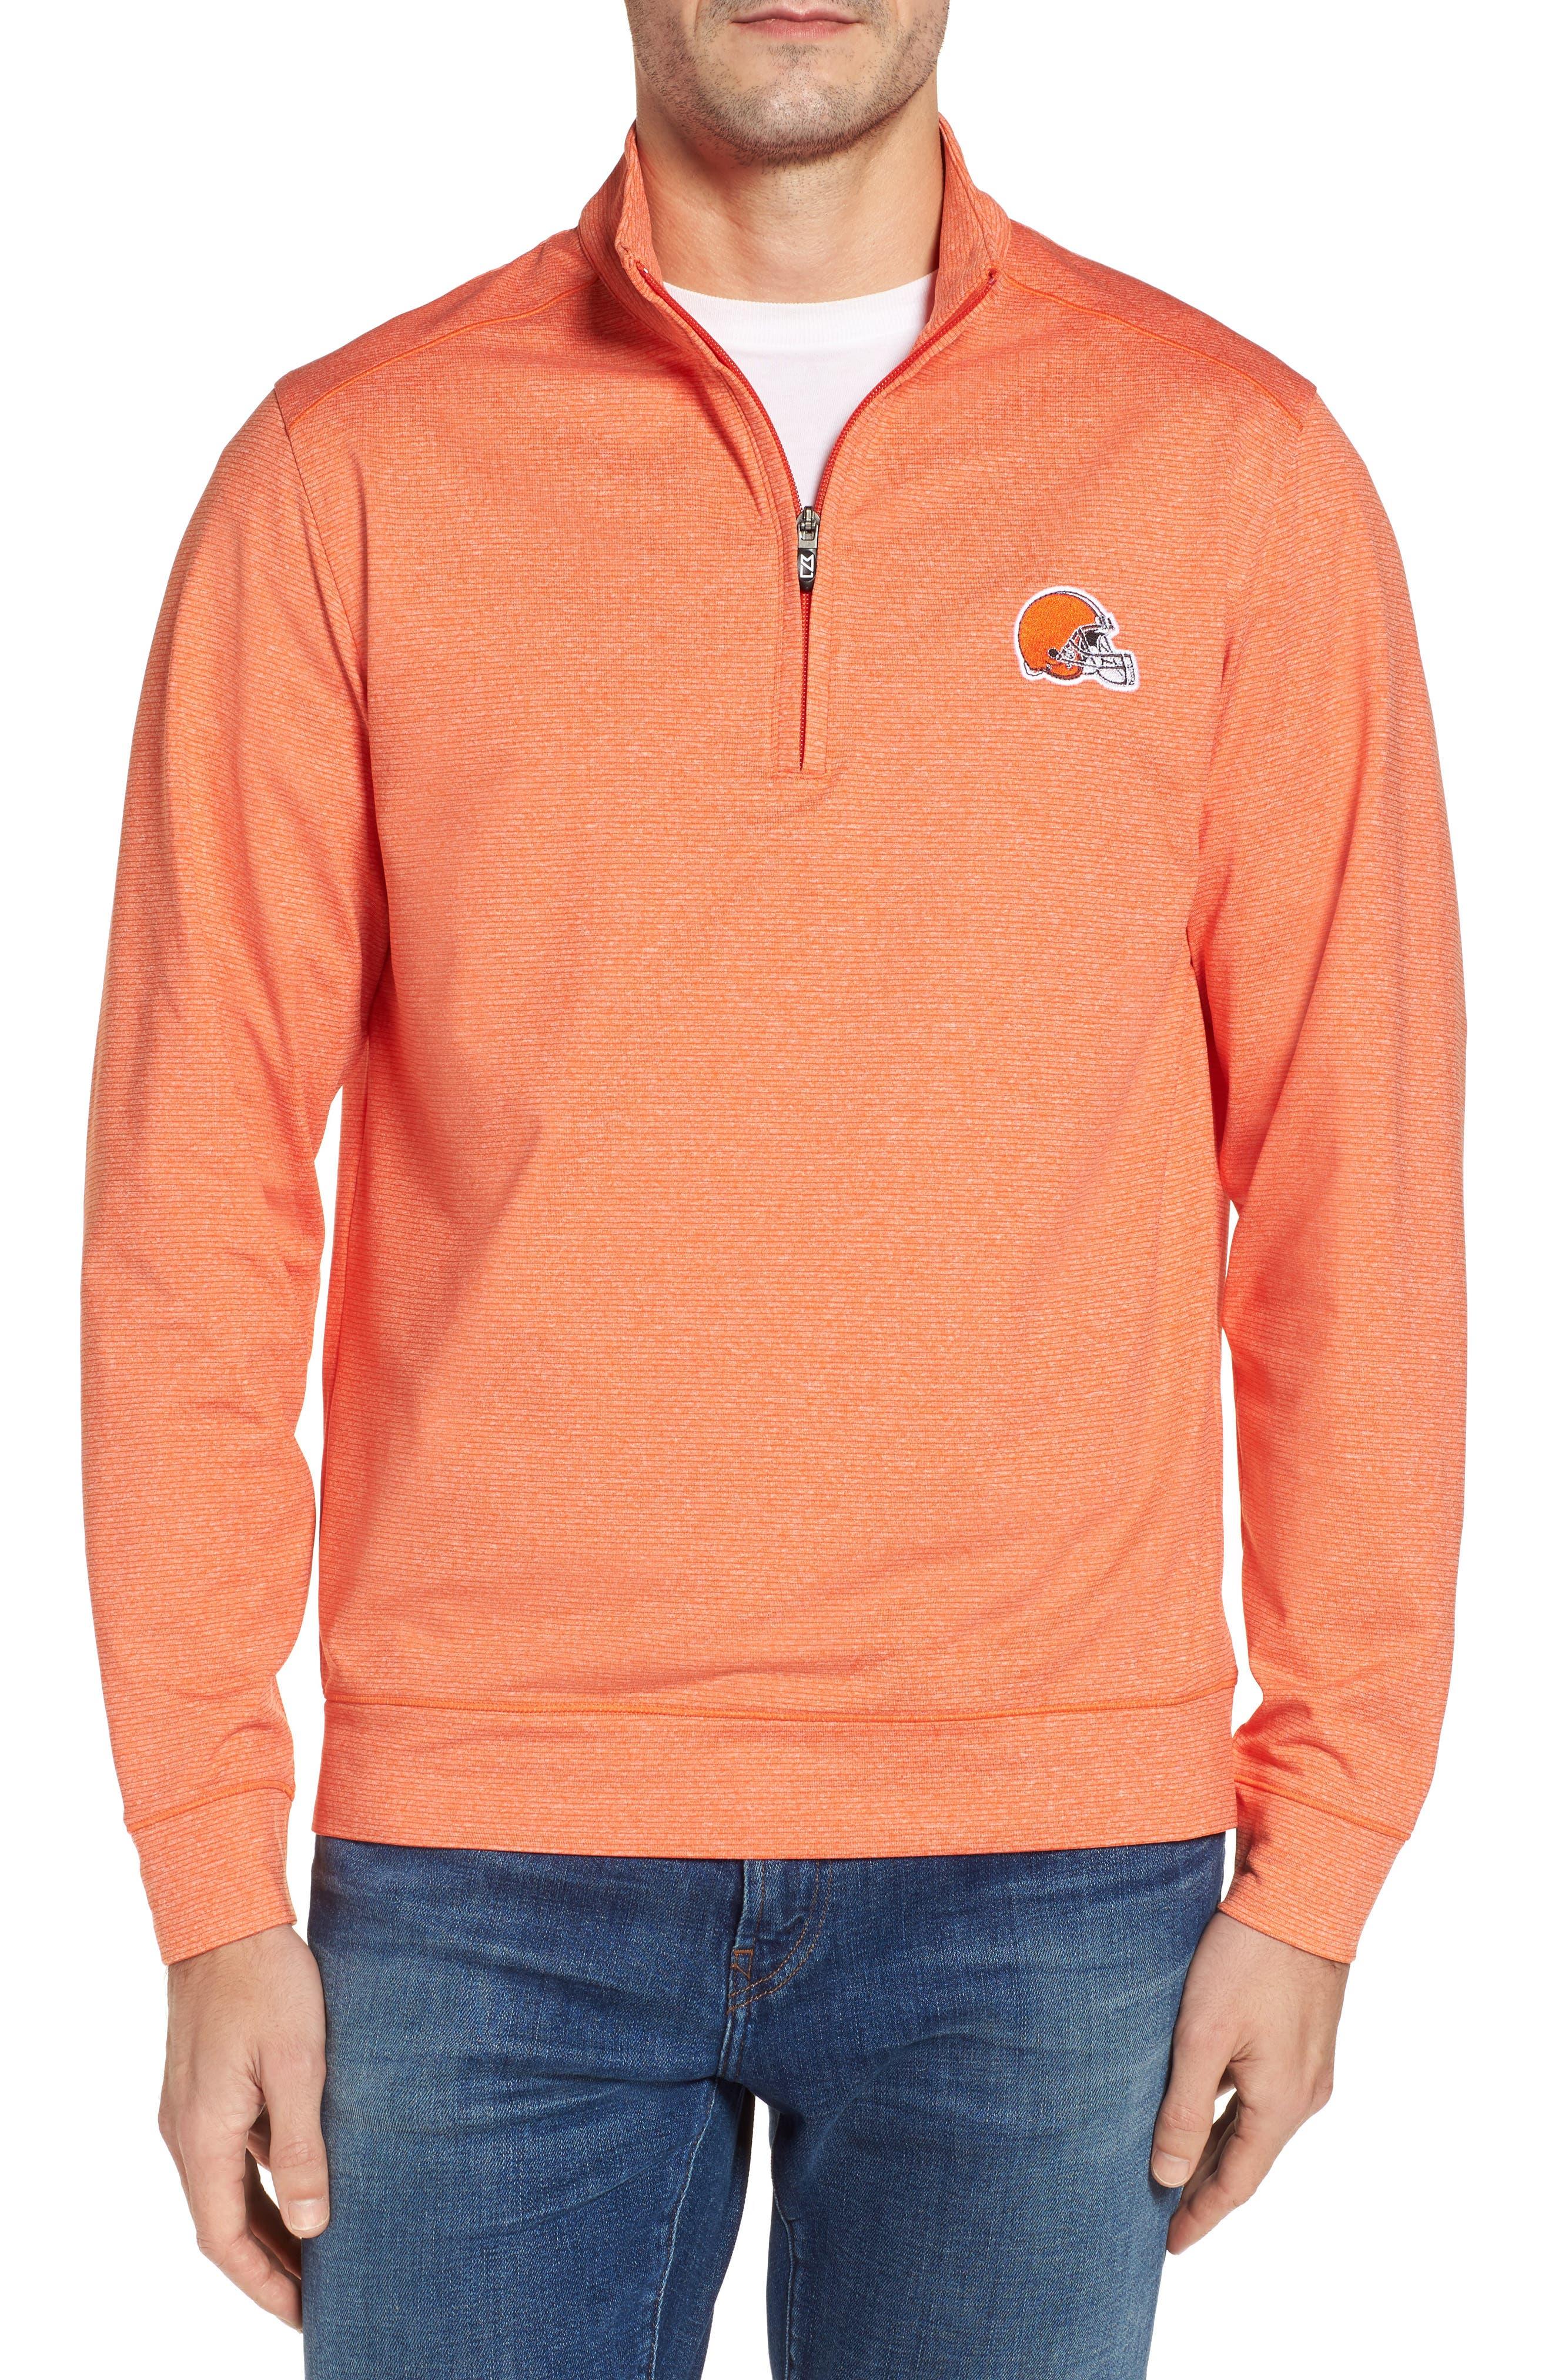 Cutter & Buck Shoreline - Cleveland Browns Half Zip Pullover